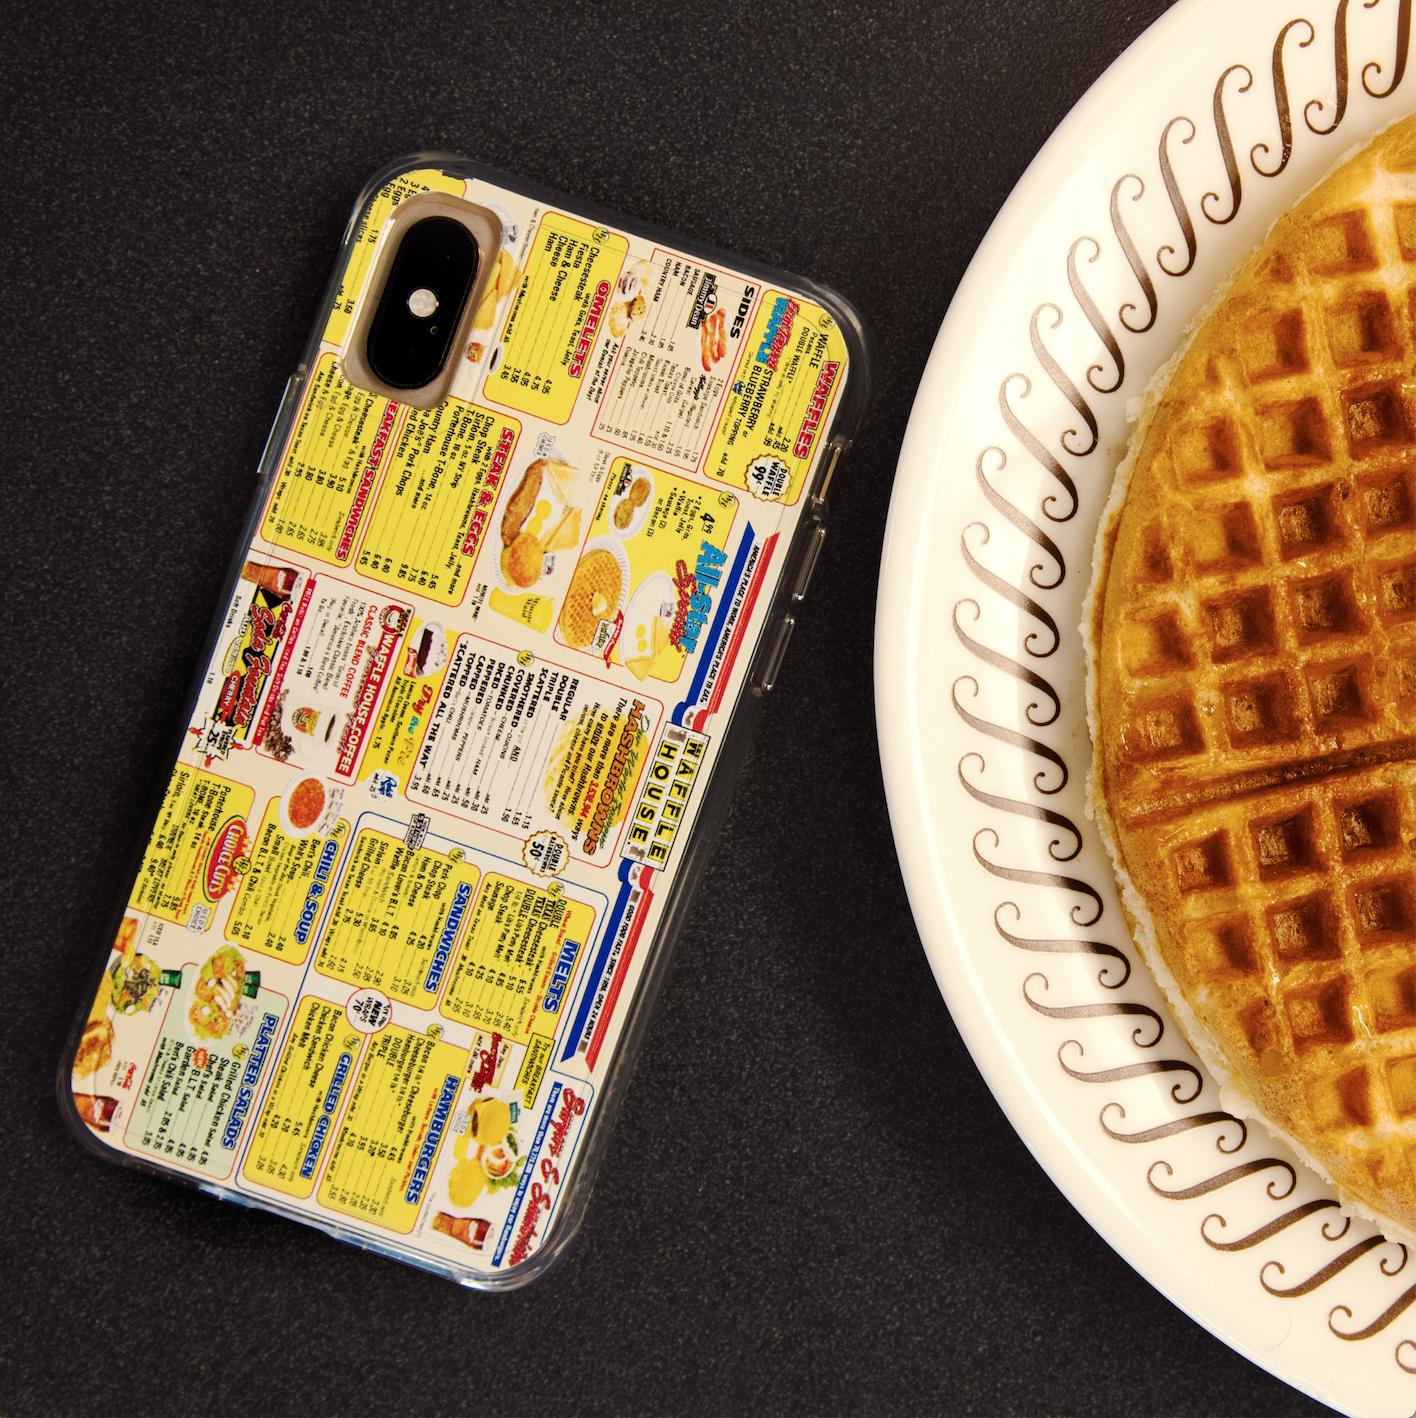 Case Mate X Waffle House Throwback Menu Case Waffle House Waffles Case Mate